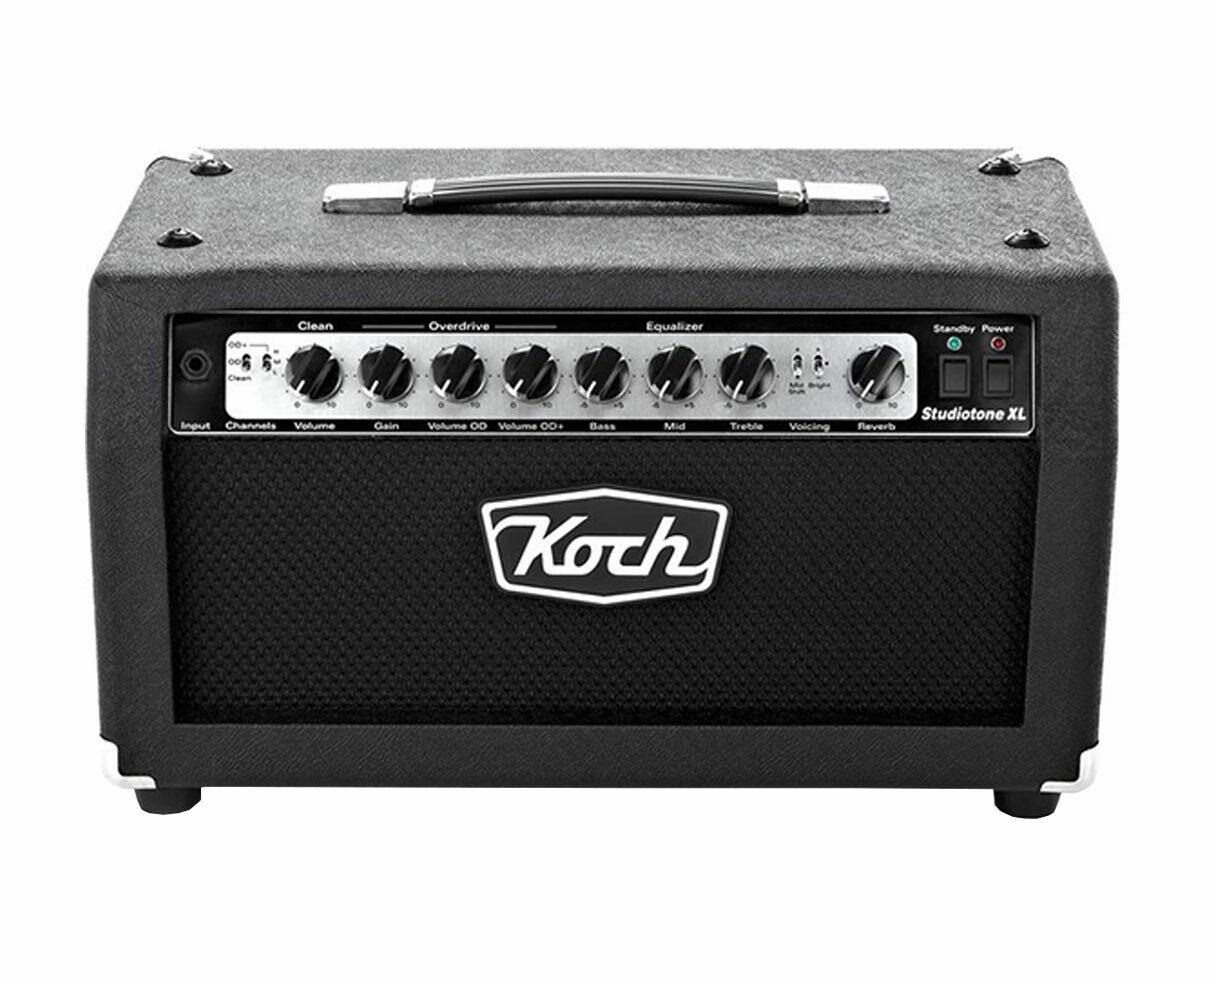 Koch Amps ST20-H Studiotone 20 Head - B-Stock. Buy it now for 699.99